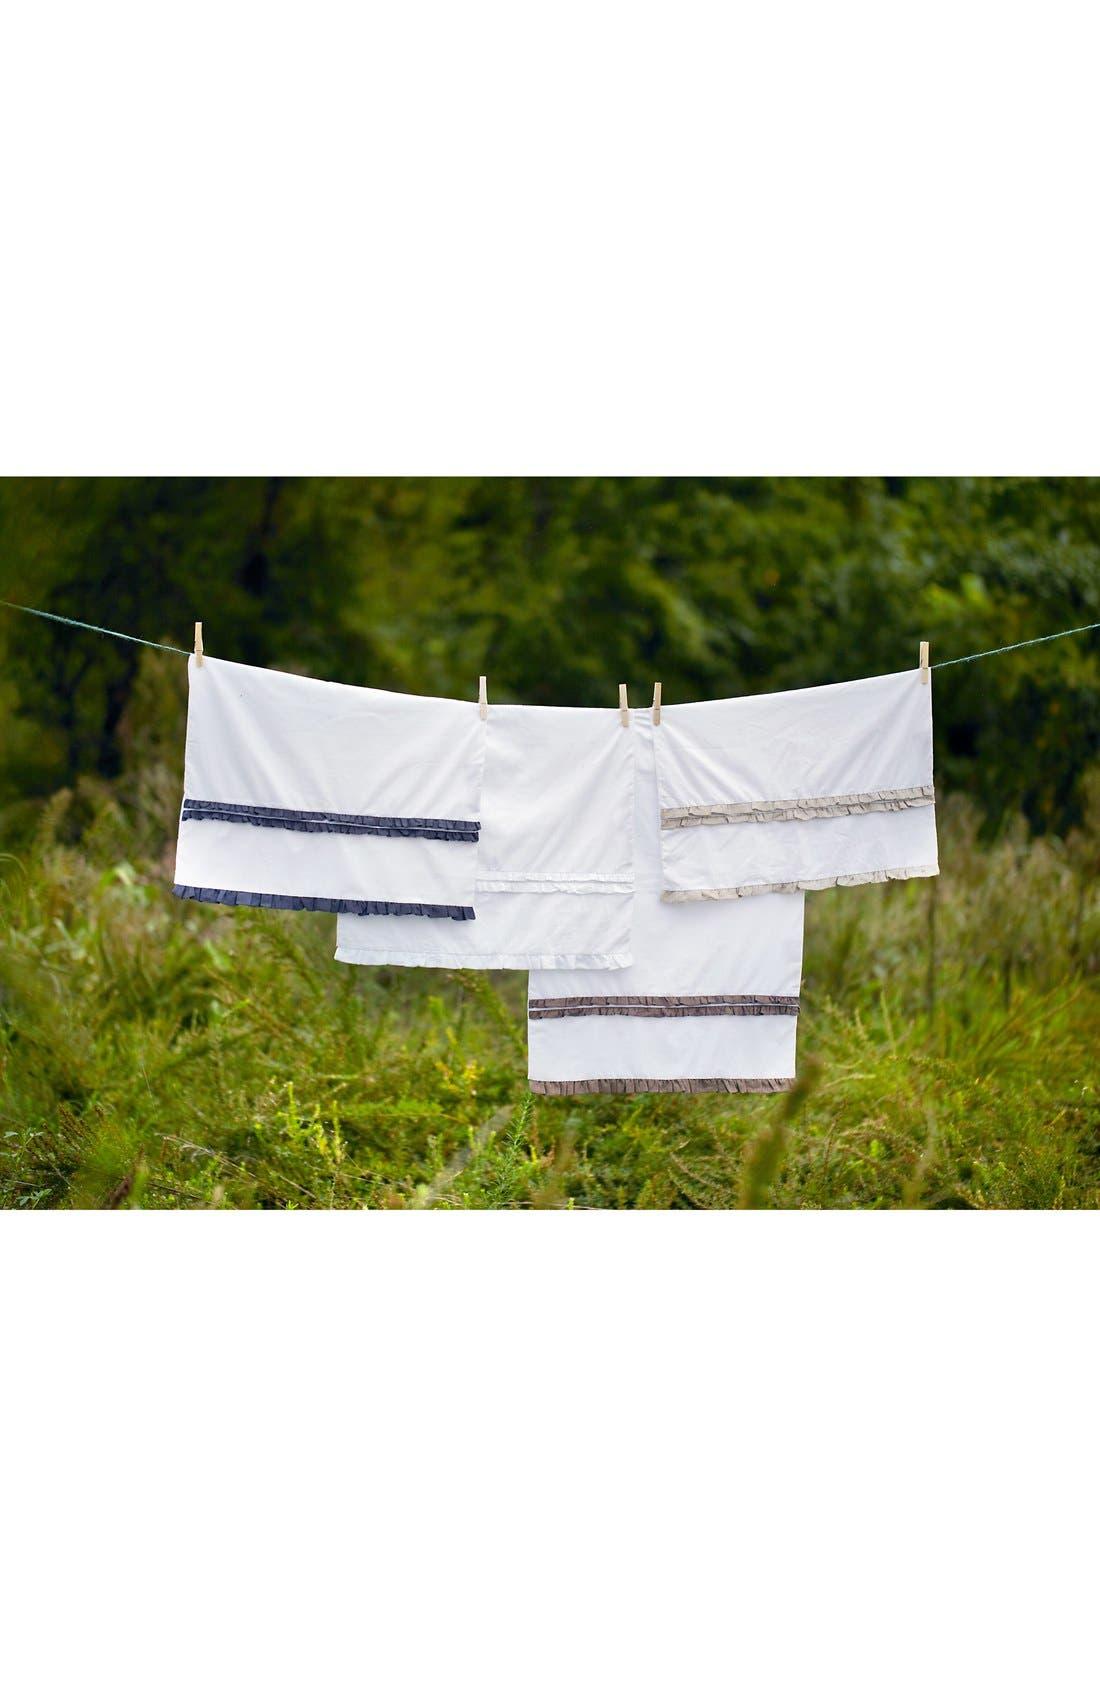 Alternate Image 3  - Amity Home 'Petite Ruffle' Linen Pillowcases (Set of 2)